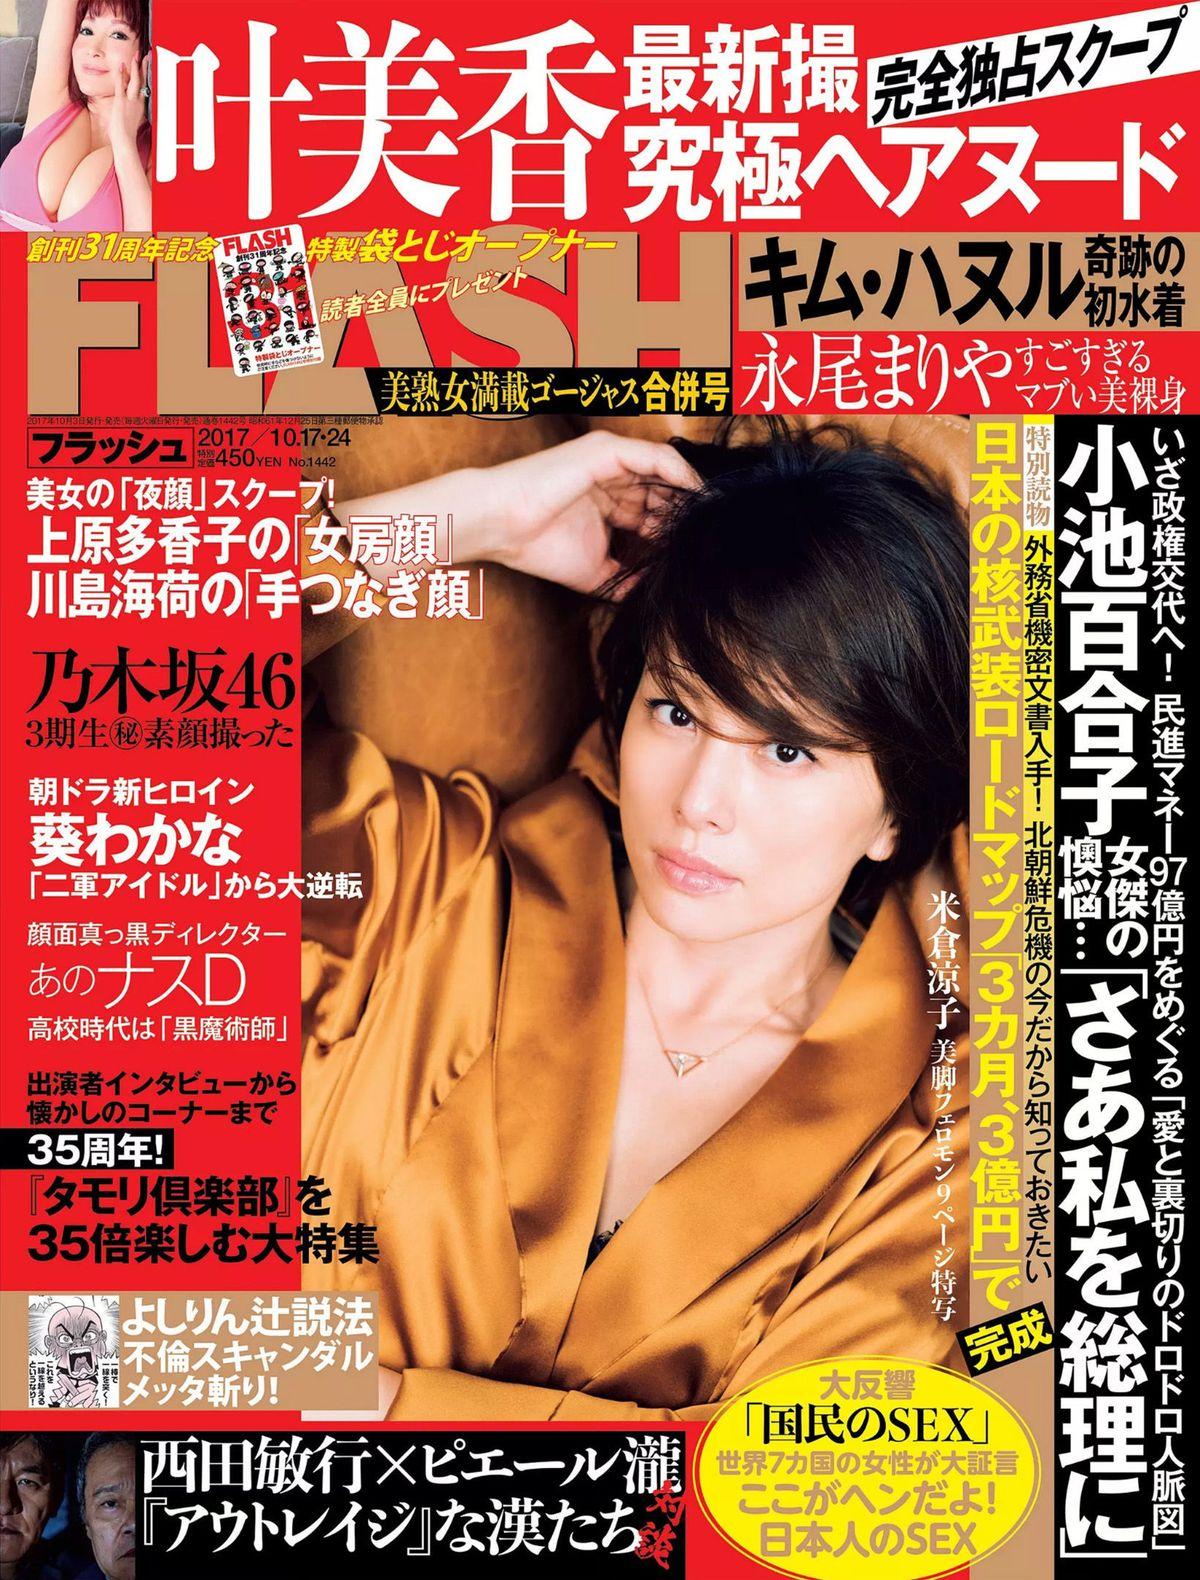 [FLASH] 米倉涼子 叶美香 橘花凛 永尾まりや 2017.10.17-24 写真杂志1